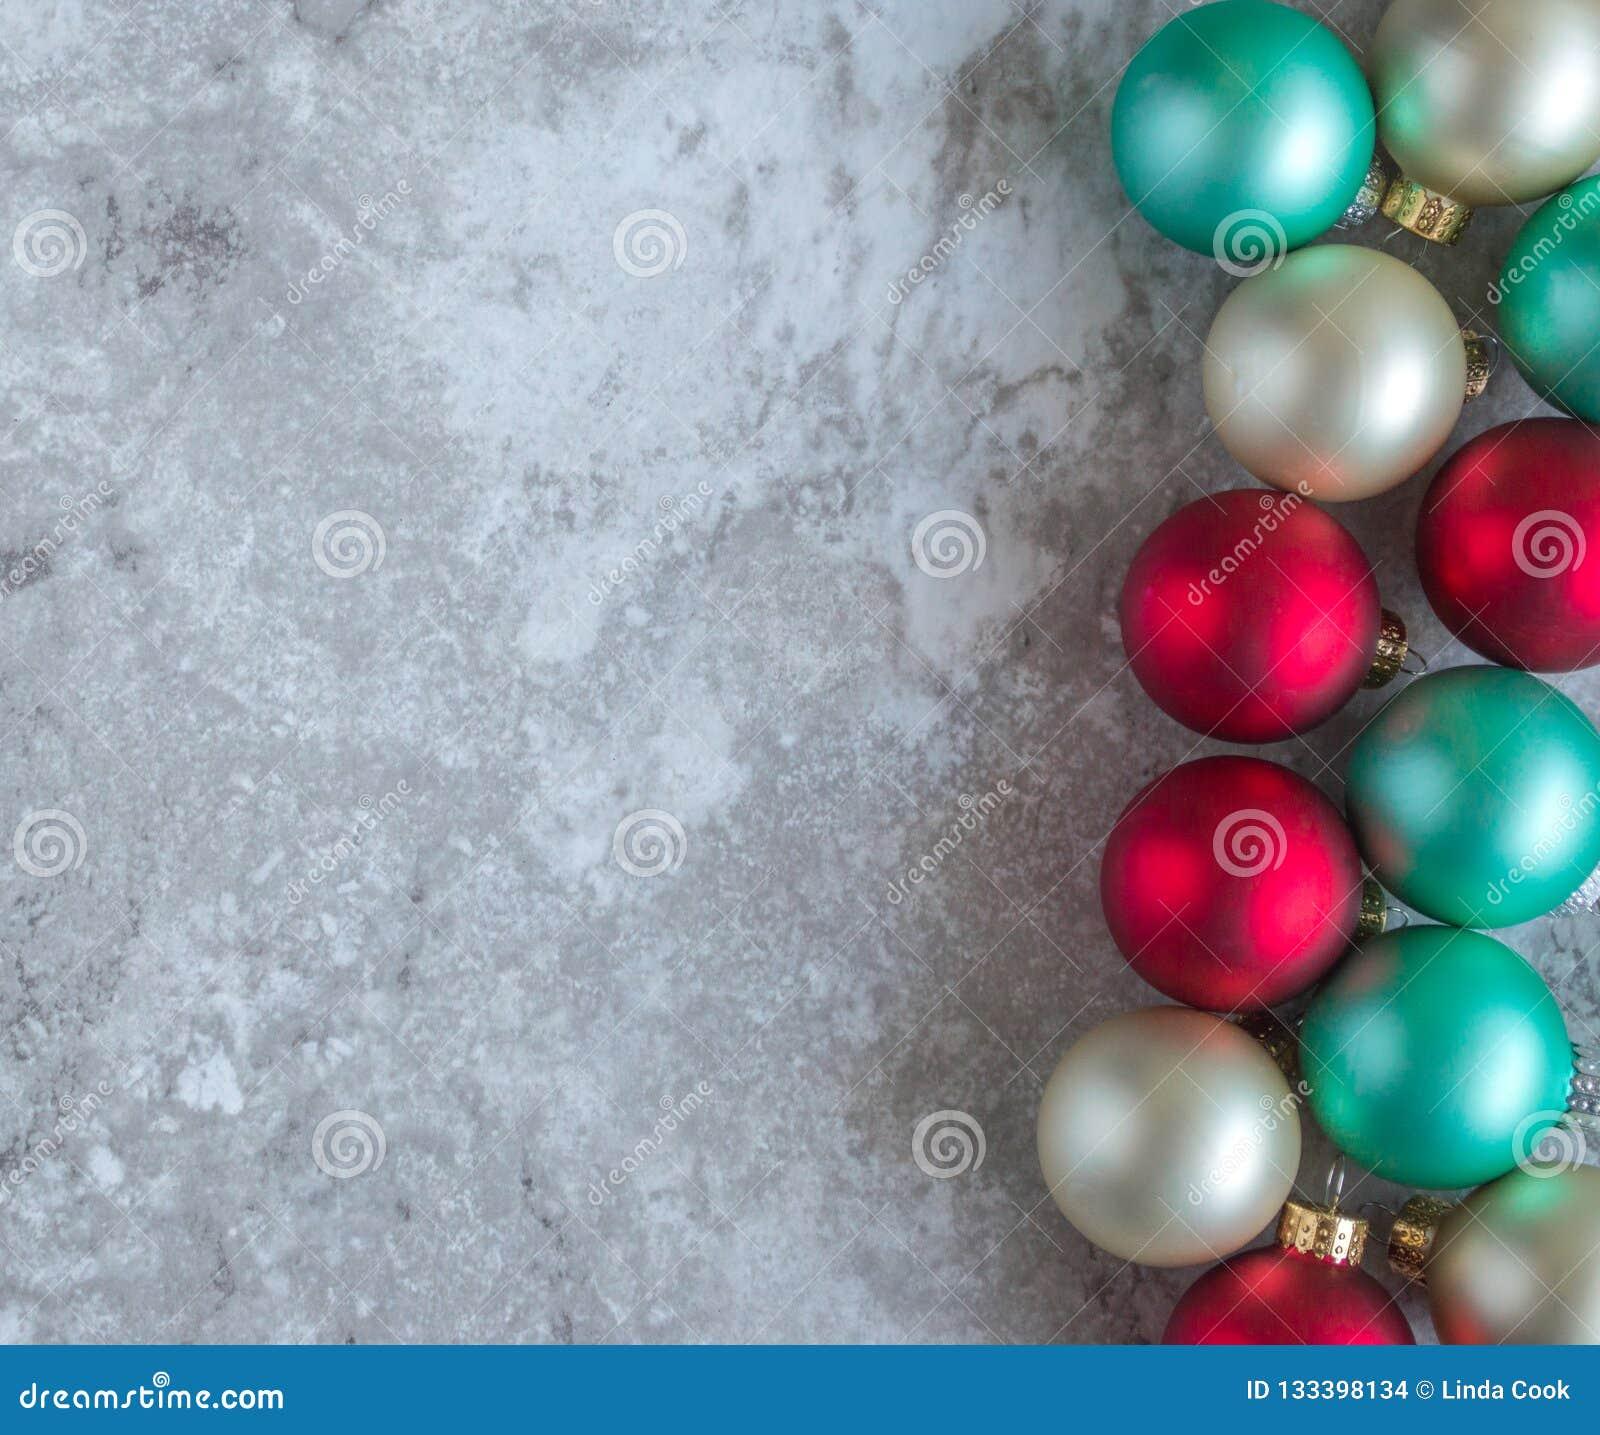 Vertical border of Christmas ornaments